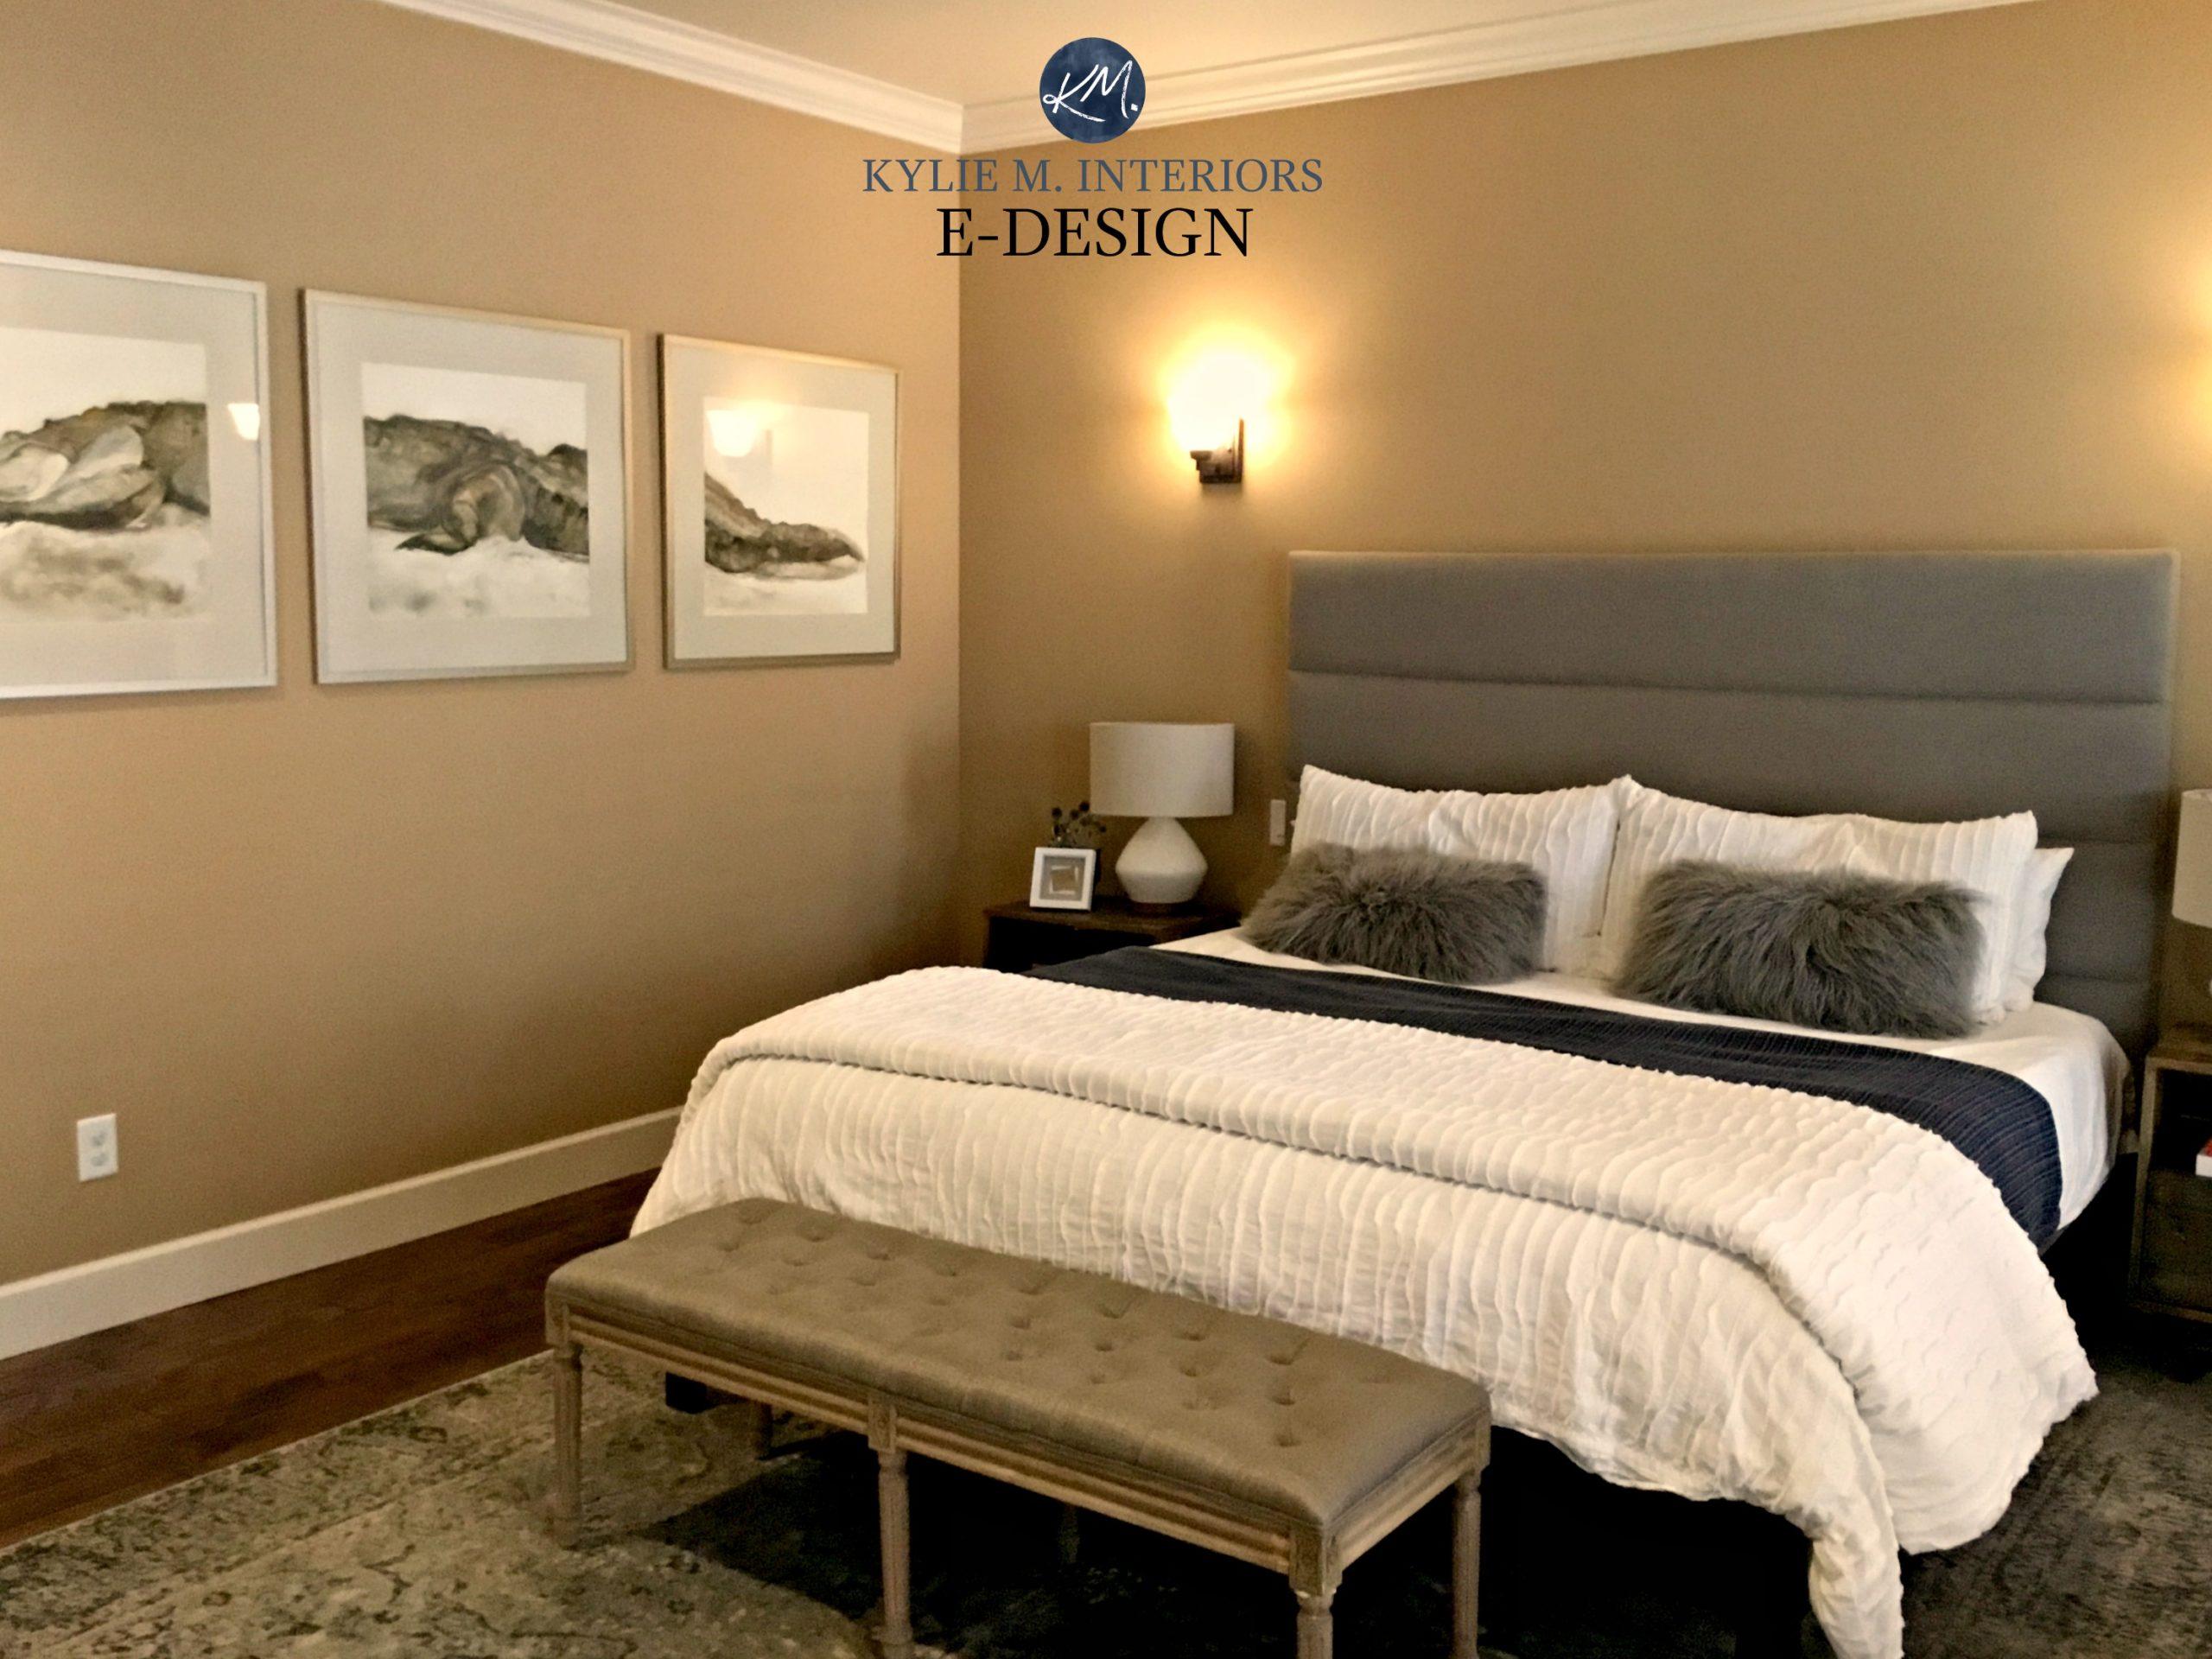 Kylie M Interiors E Design. Benjamin Moore Palm Desert Tan. Before Image.  Client Design